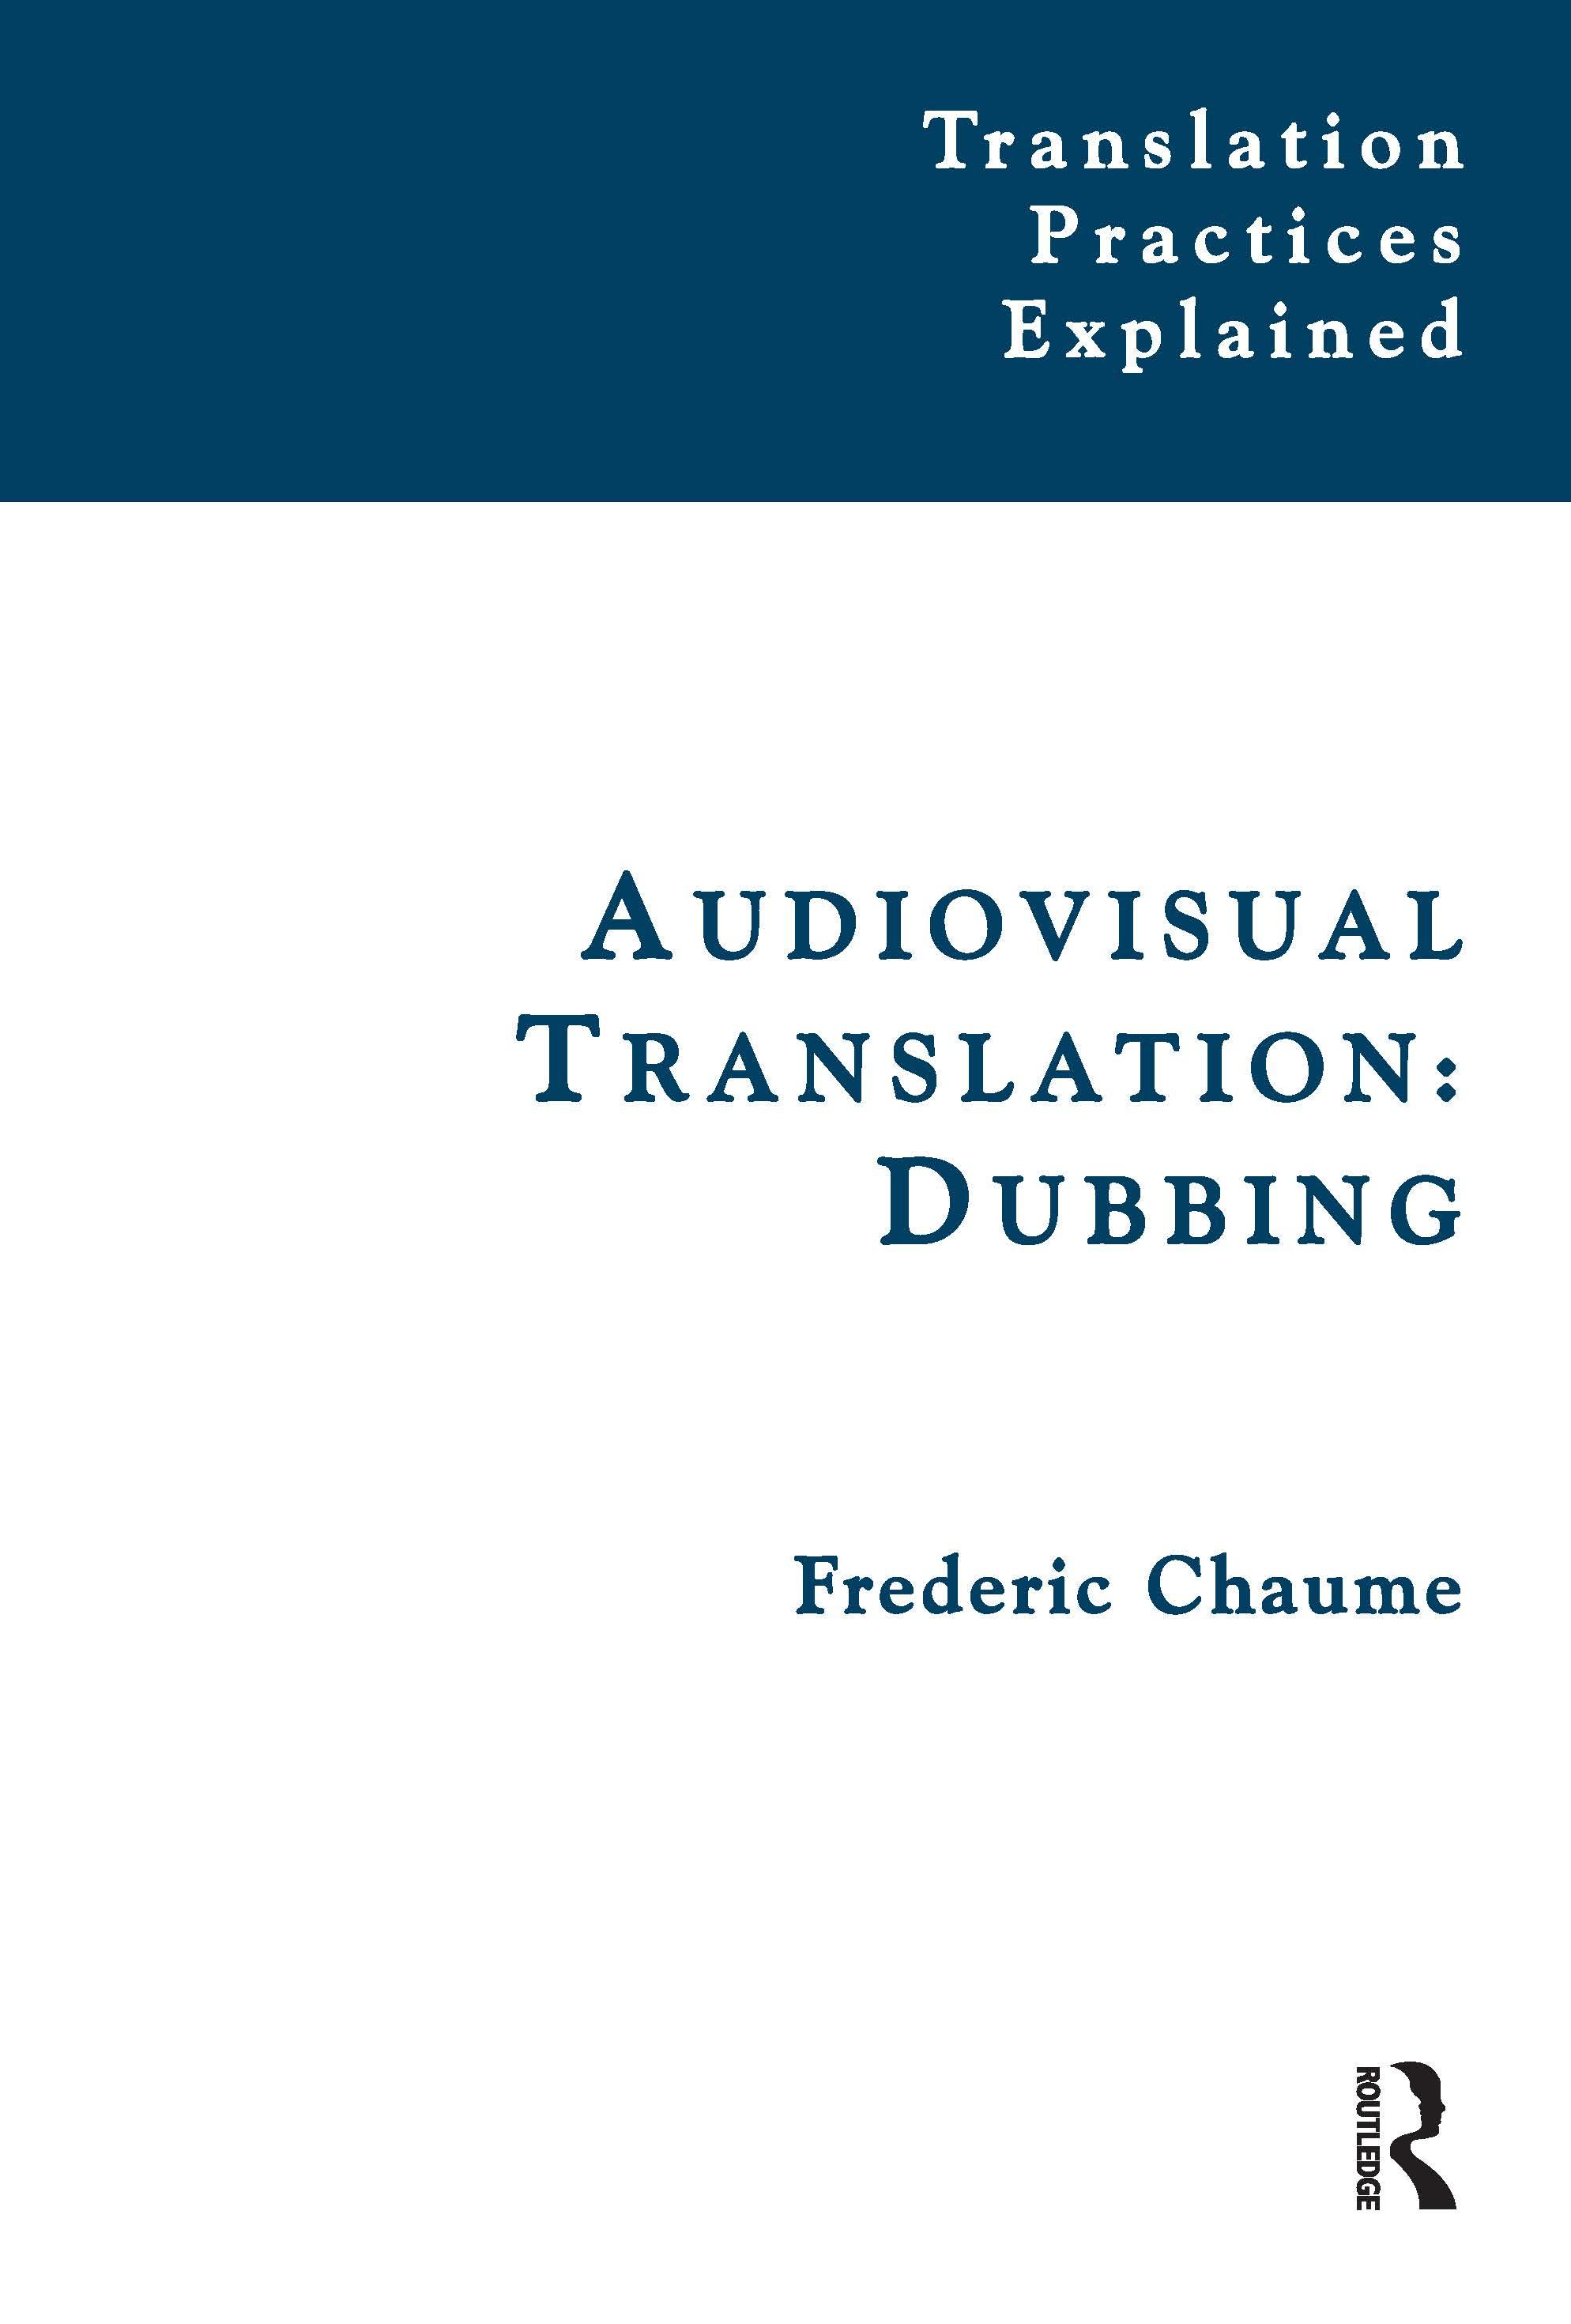 Audiovisual Translation: Dubbing book cover